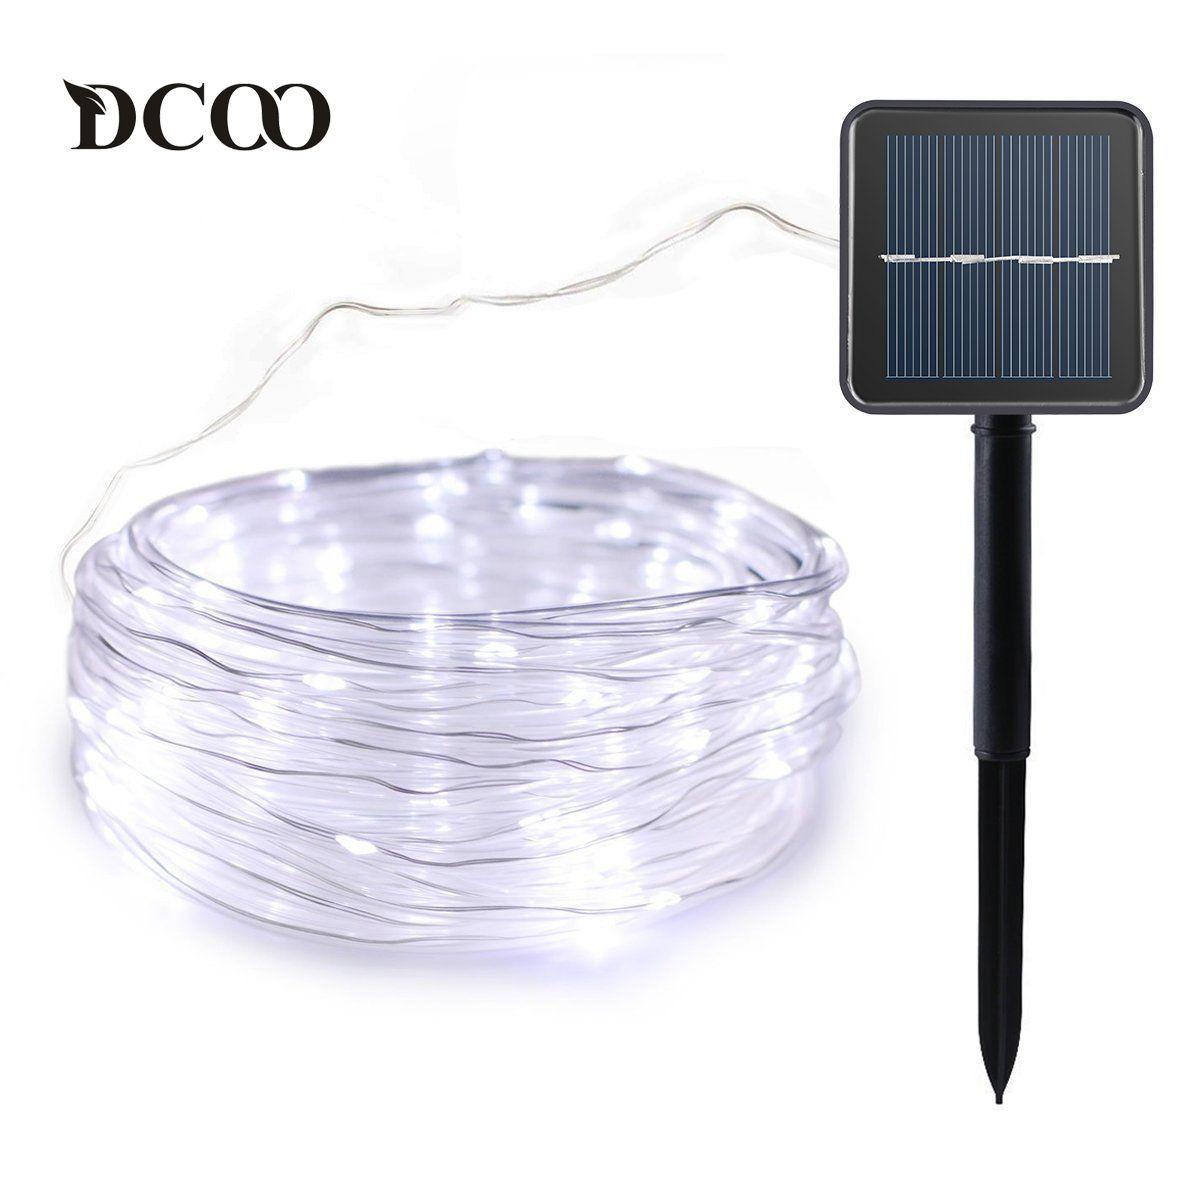 Solar Rope lights 120 LEDs Solar Powered LED <font><b>String</b></font> Lights Outdoor Garden Party Lighting Solar Rope <font><b>String</b></font> Lights Waterproof